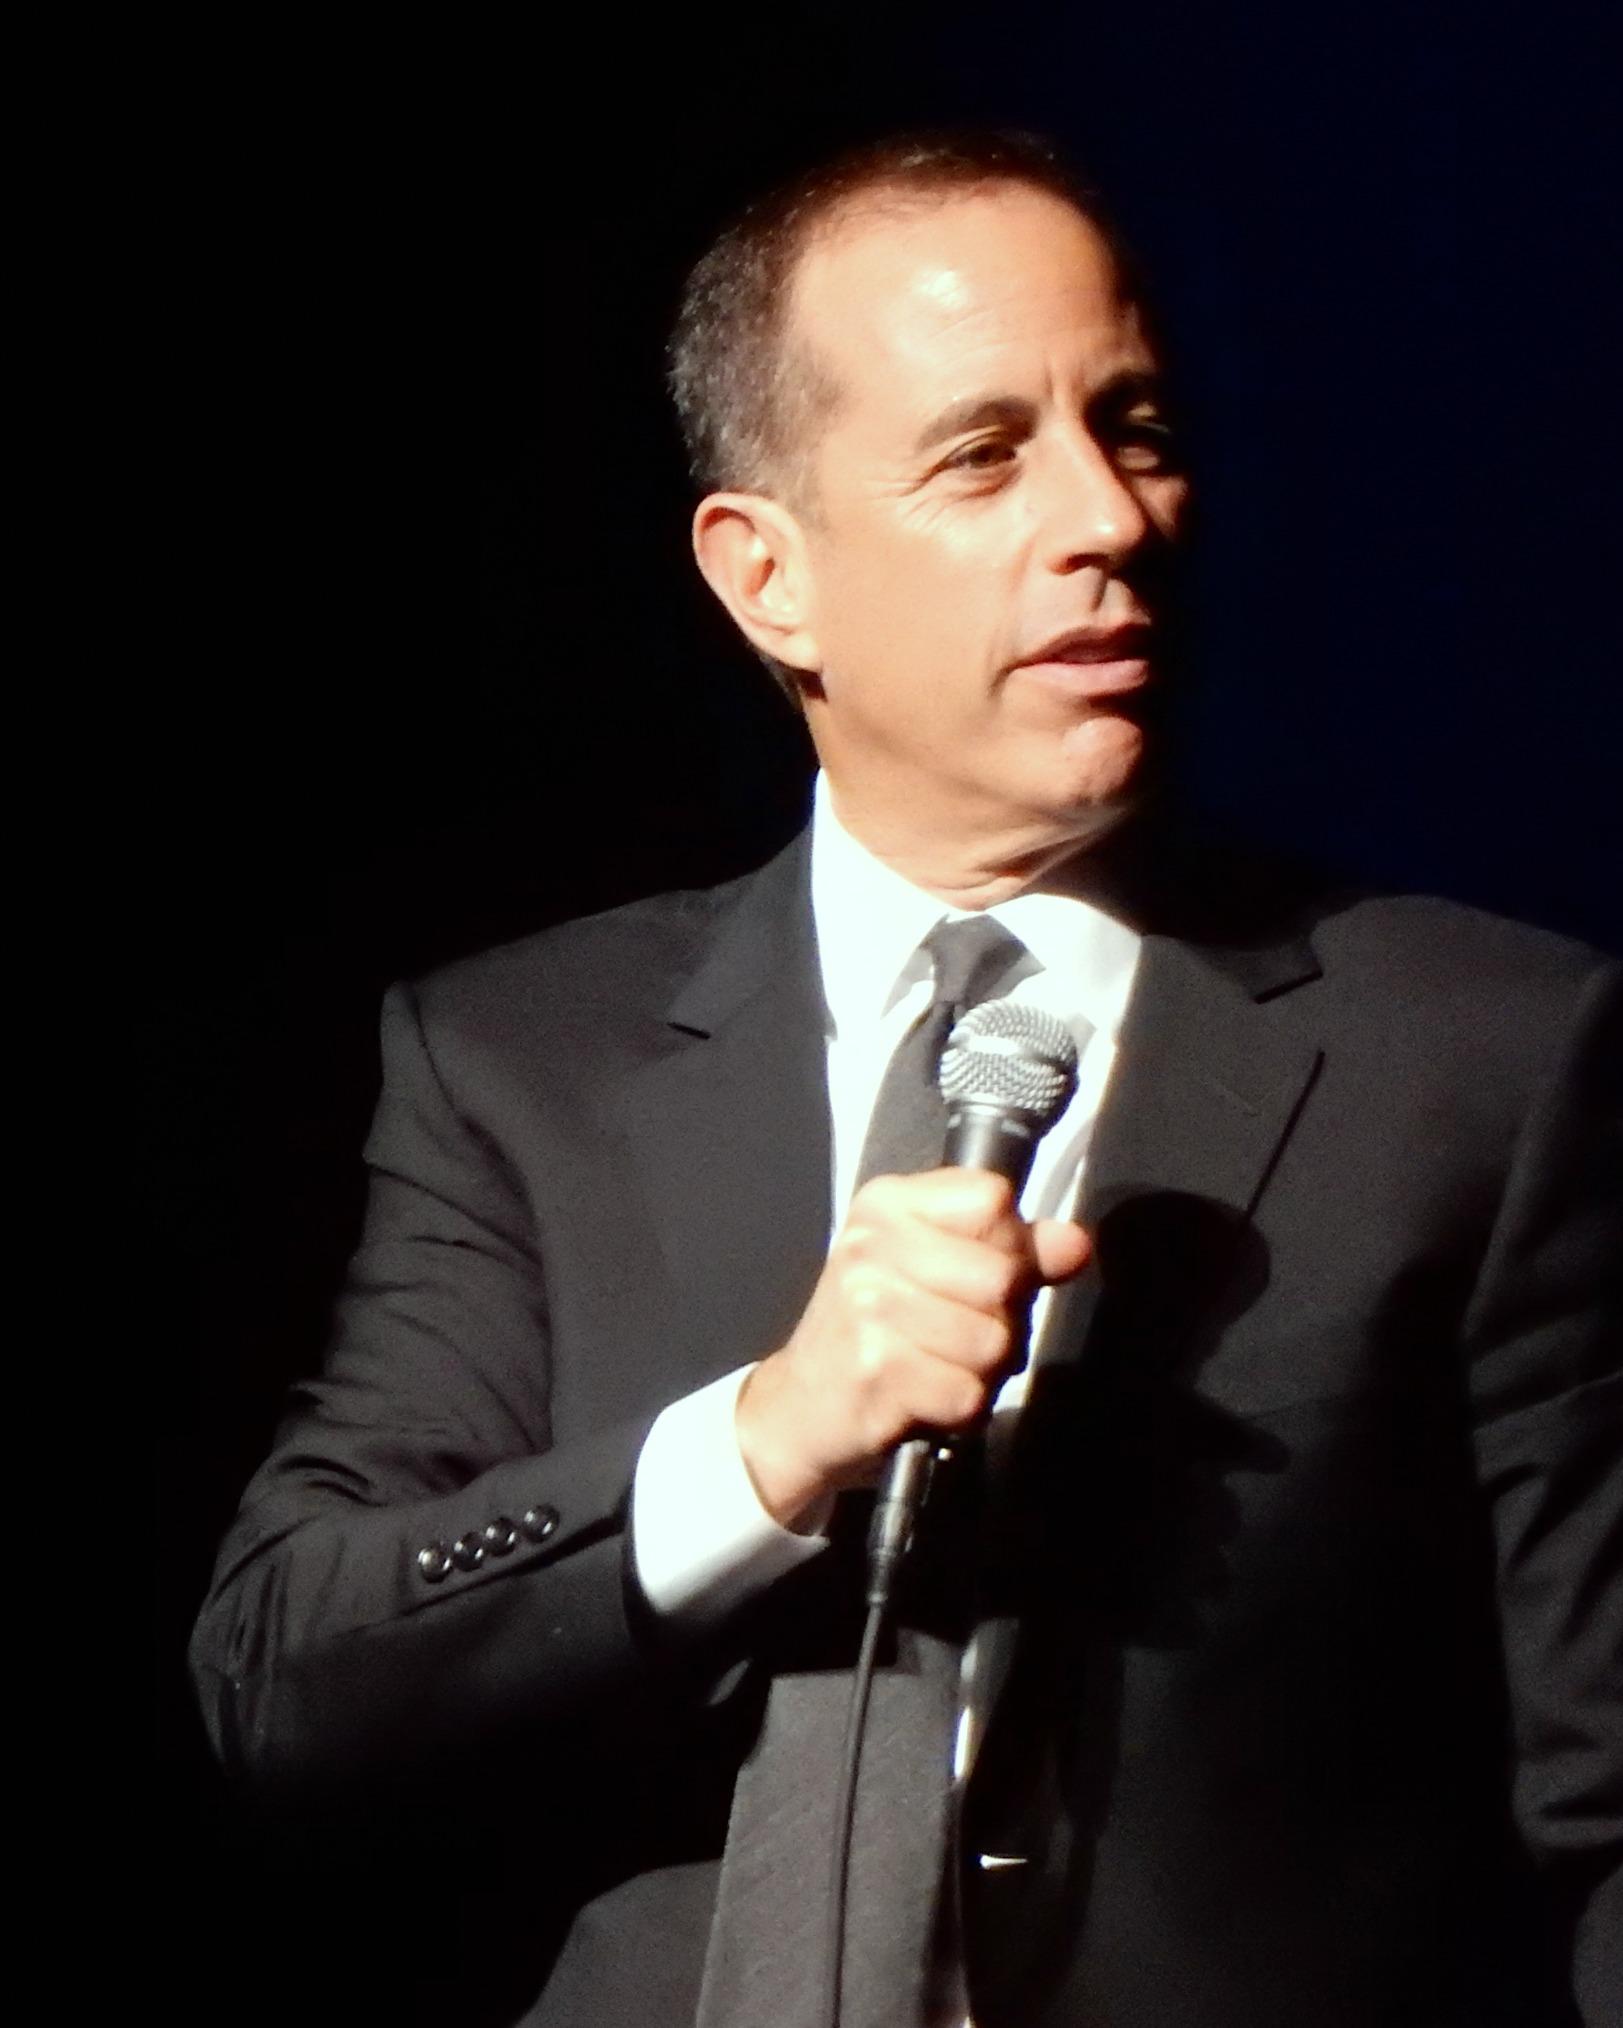 Photo Jerry Seinfeld via Opendata BNF